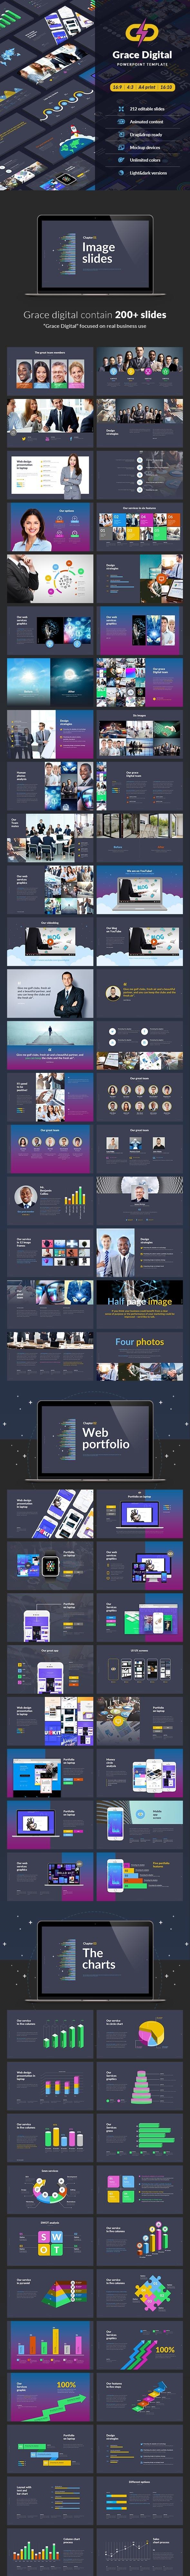 Grace Digital - Powerpoint template - Business PowerPoint Templates